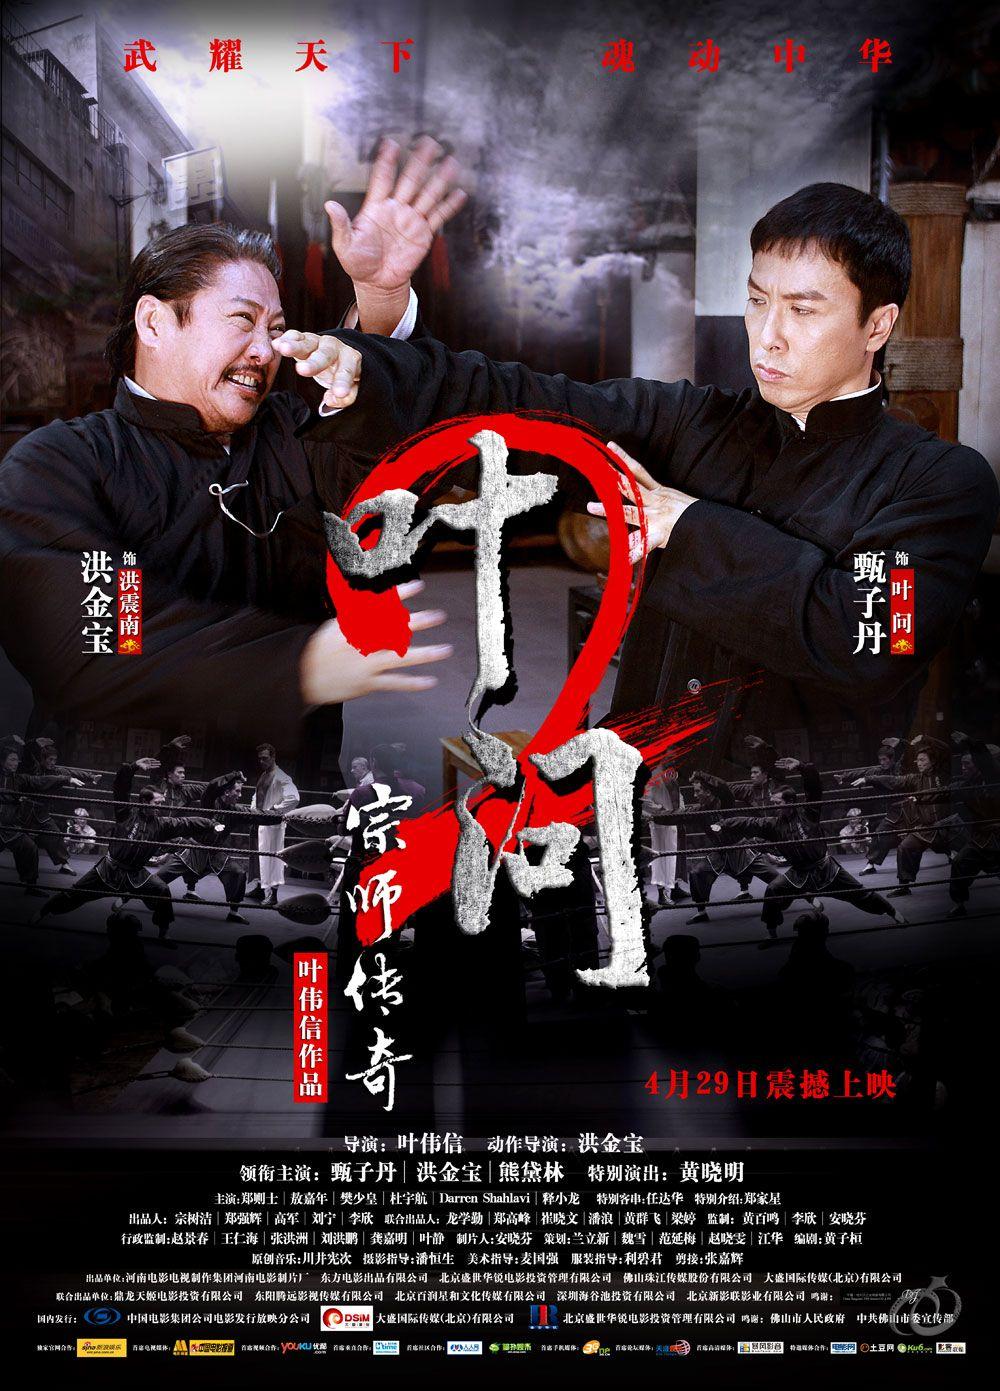 5 Ip Man 2 Director Wilson Yip 2010 The Rocky Iv Of Ip Man Movies Dlmchallenge 365days 365movies Inspirational Movies Ip Man Movie Ip Man